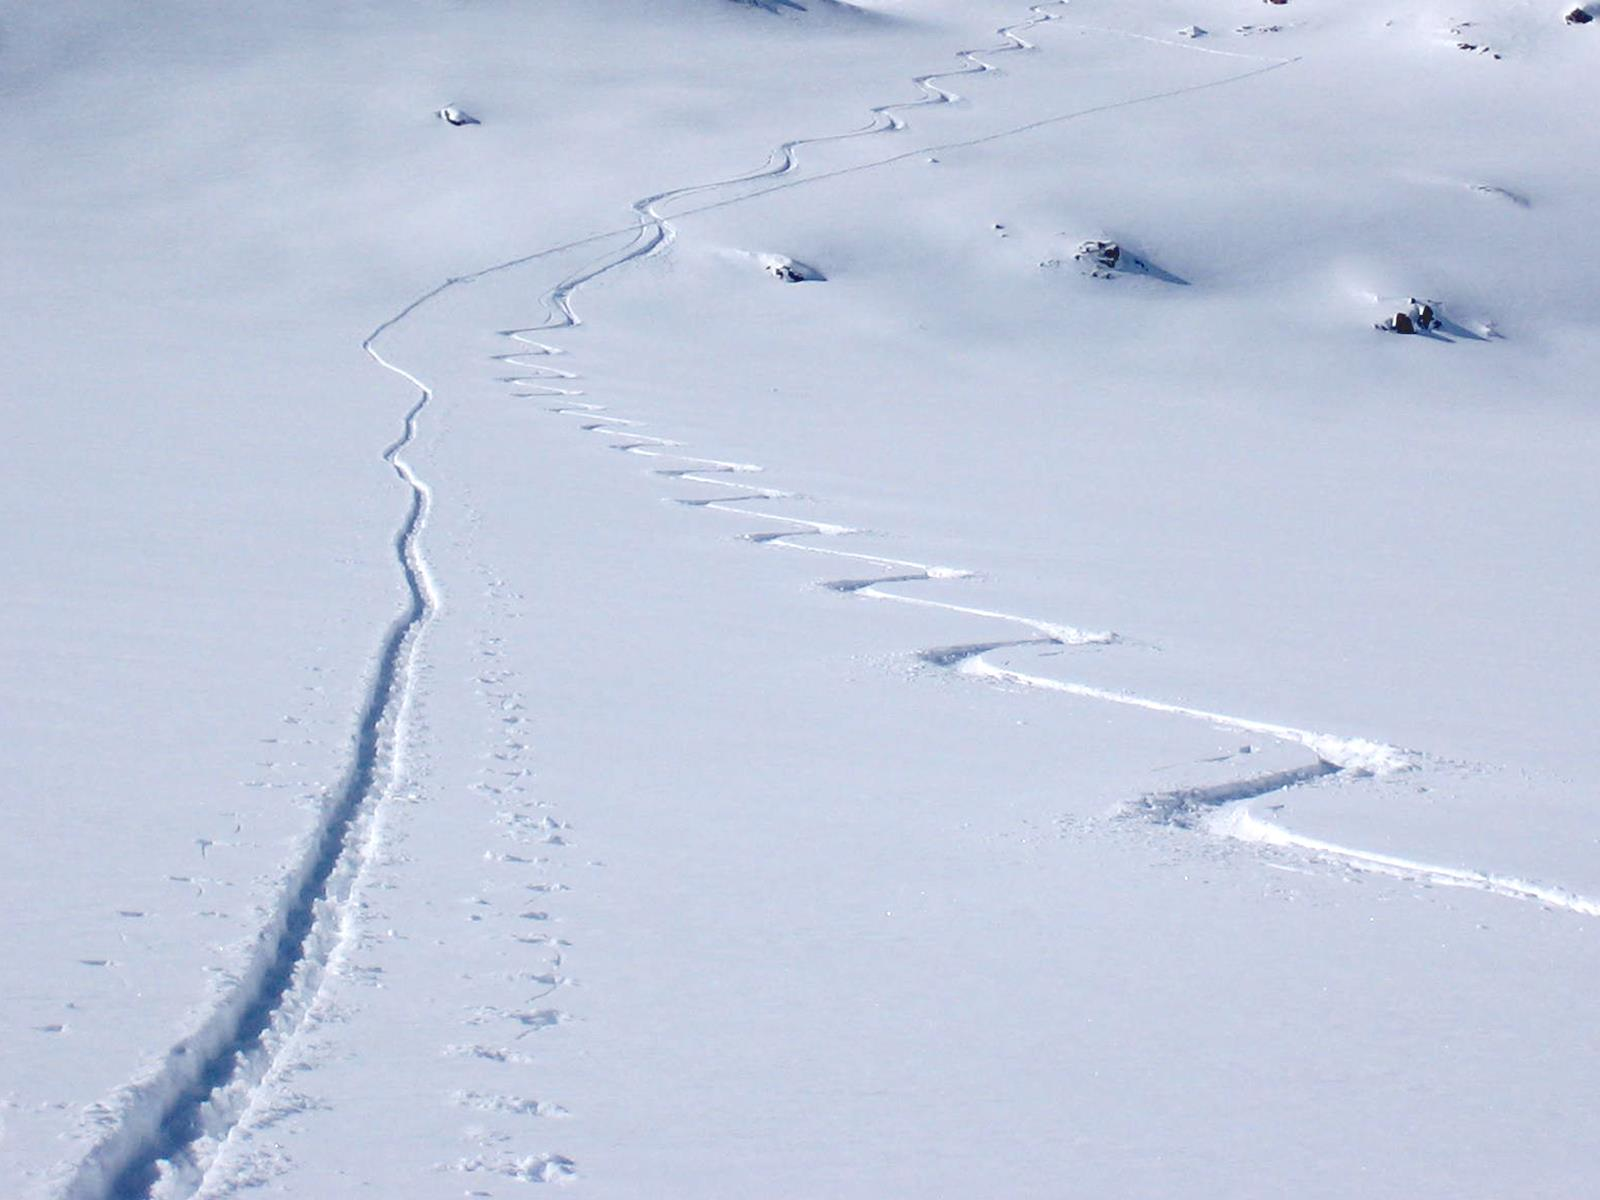 Ratschinger Kreuz summit ski tour